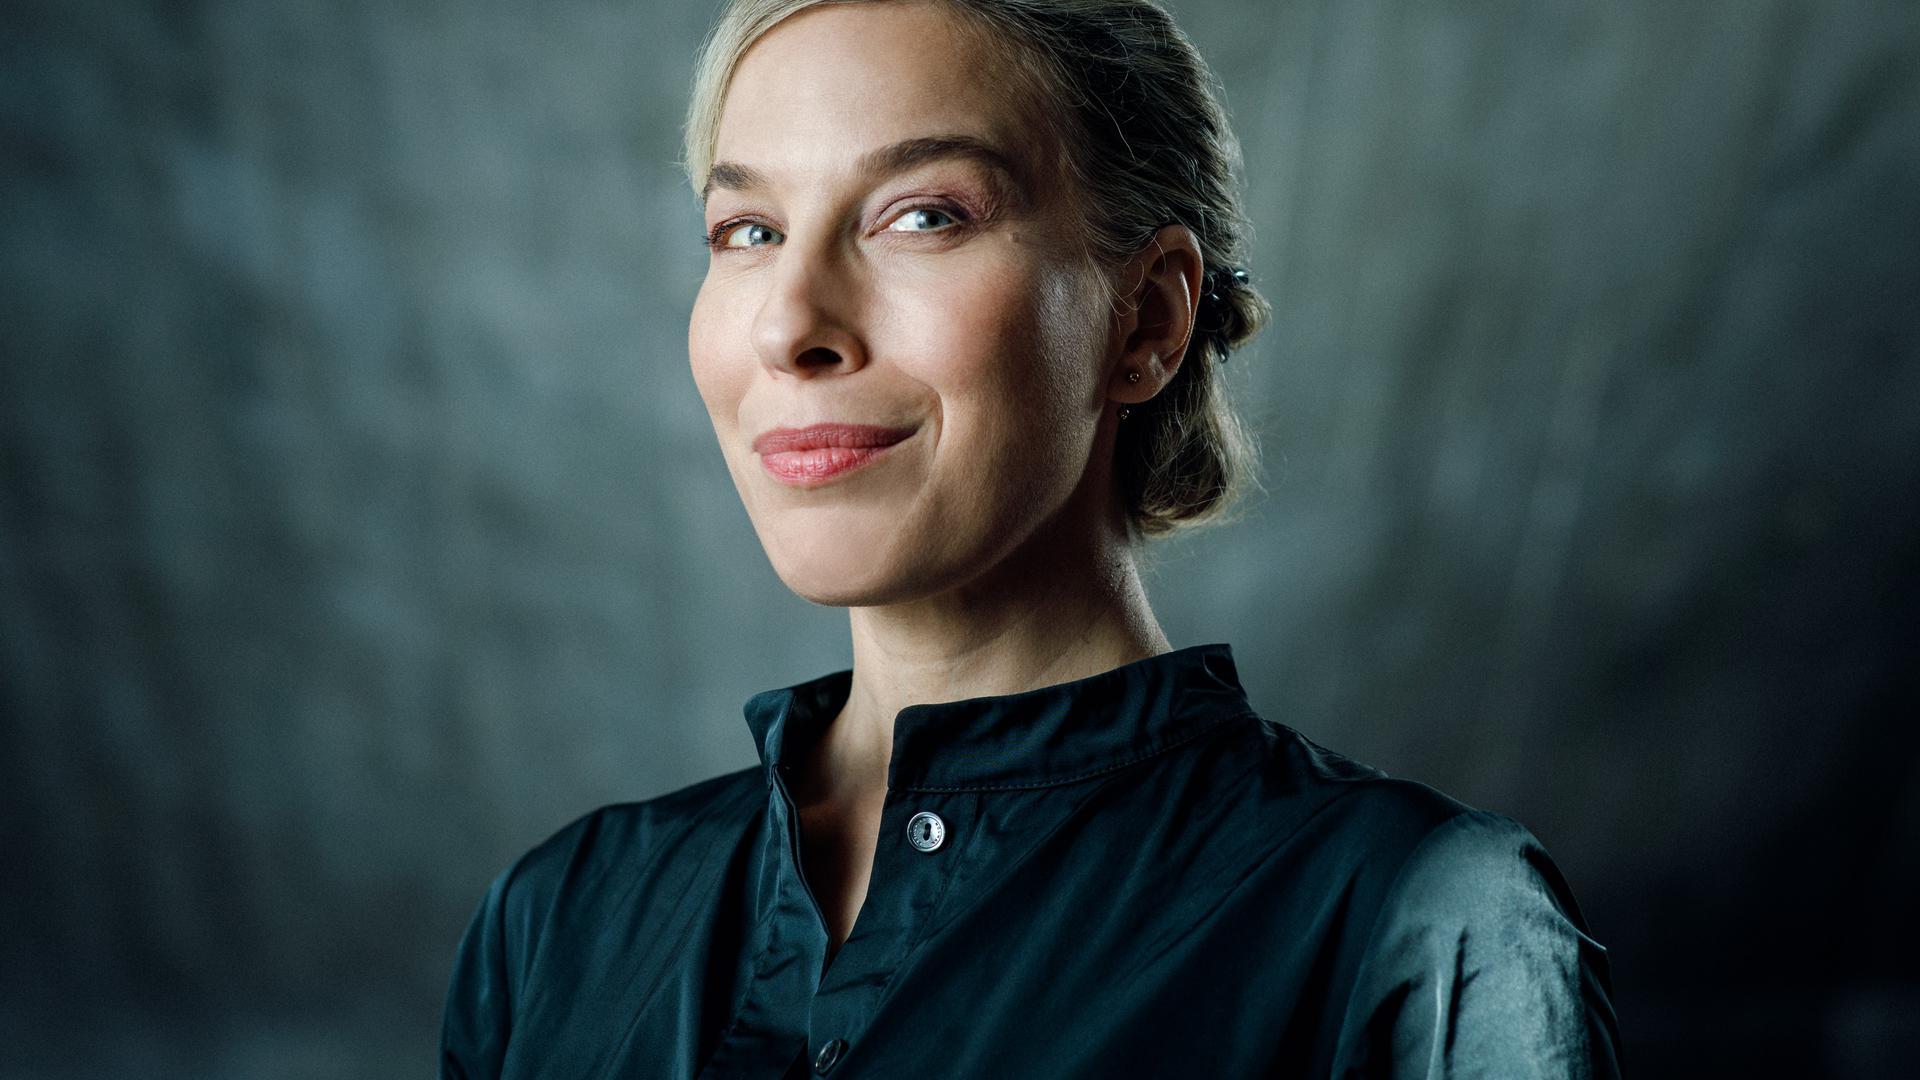 Nicole Braunger ist seit 2018 Operndirektorin am Staatstheater Karlsruhe.